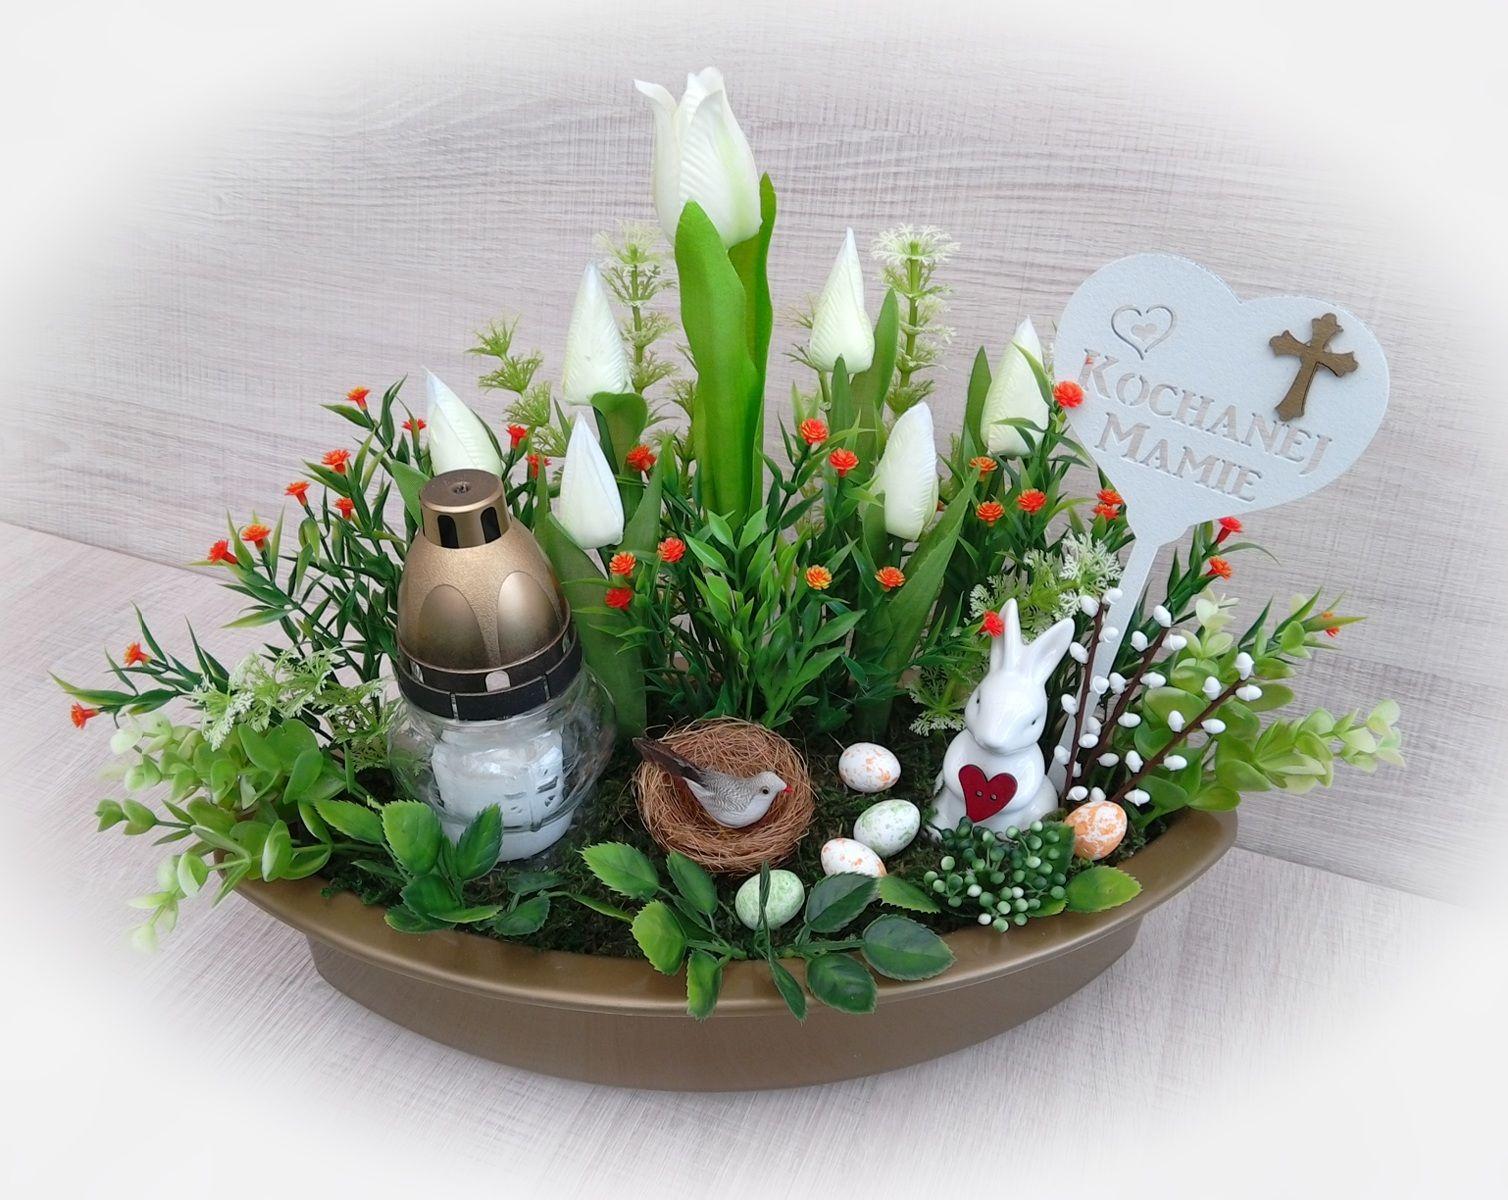 Stroik Wielkanocny Na Cmentarz Table Decorations Diy Decor